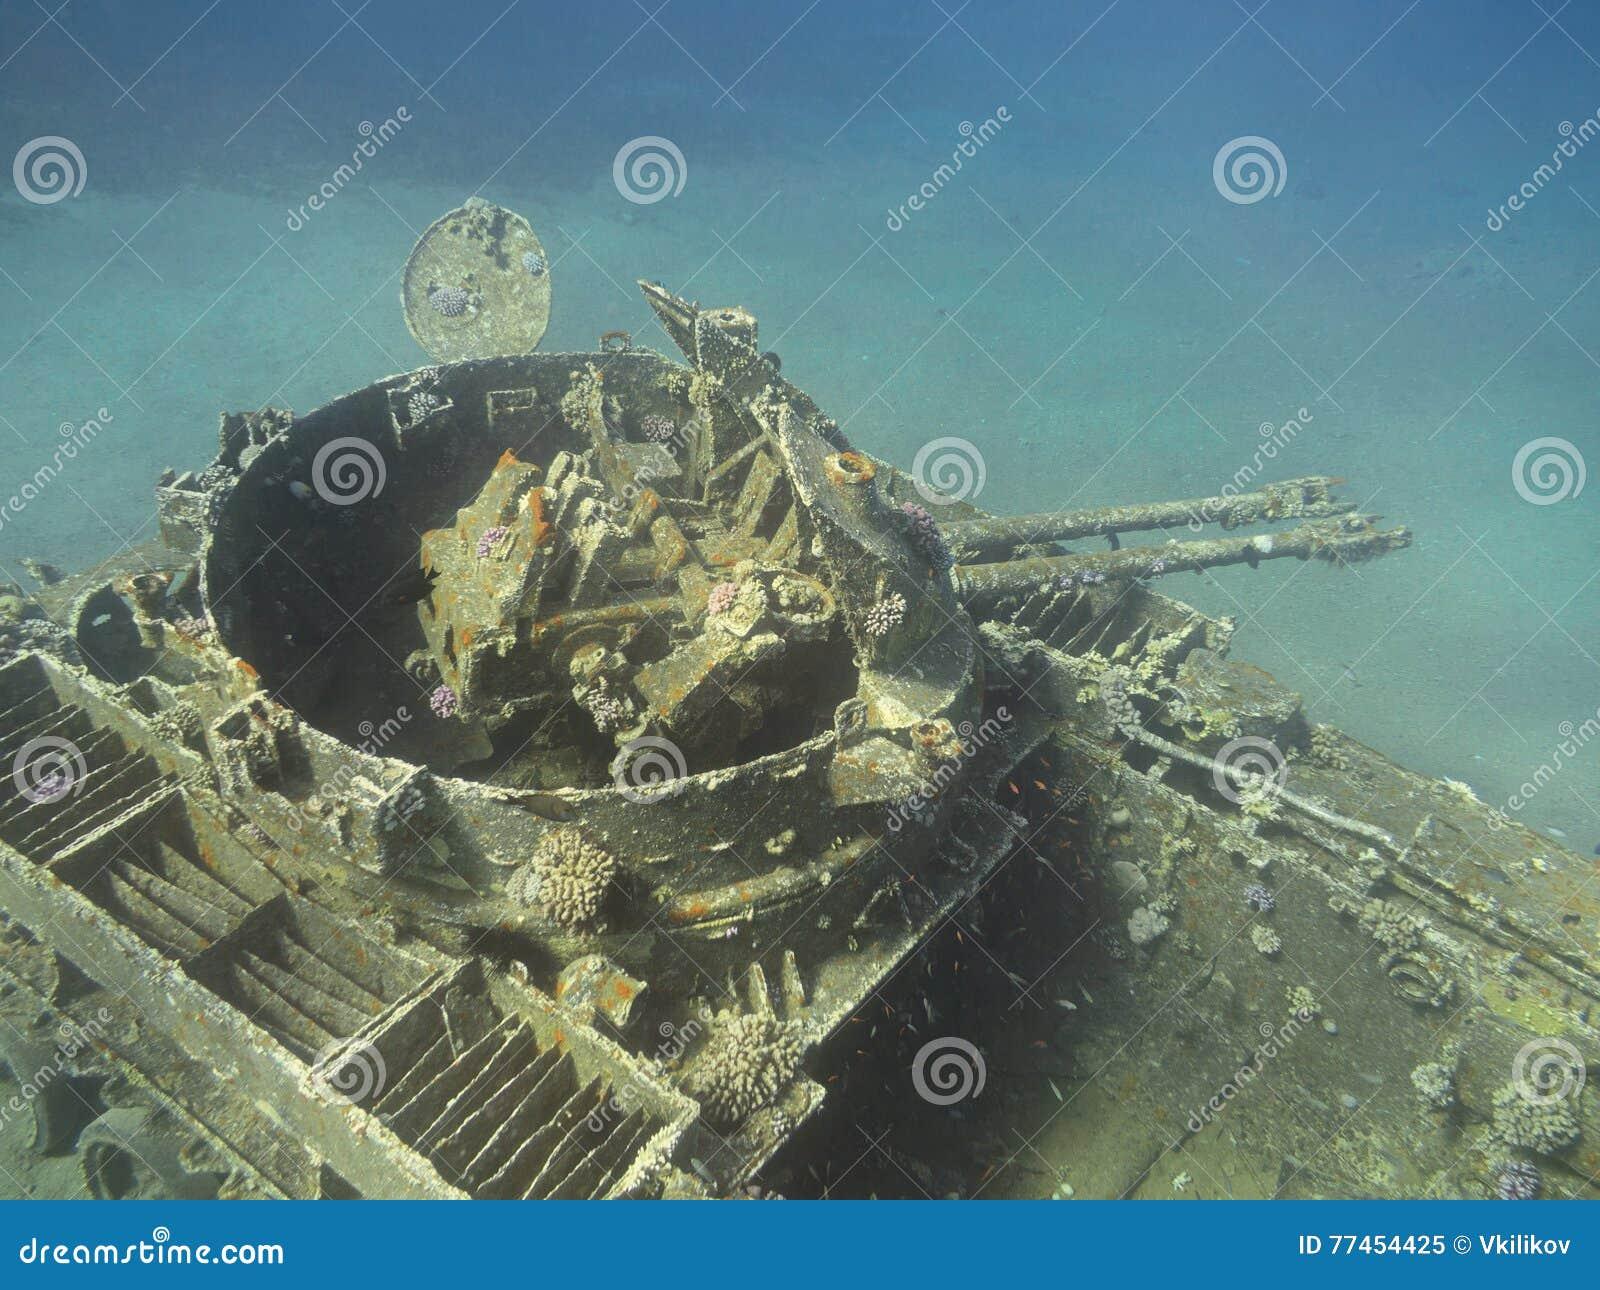 Sunken Tank Wreck At Aqaba, Jordan, Underwater Stock Image ... Sunken Tank